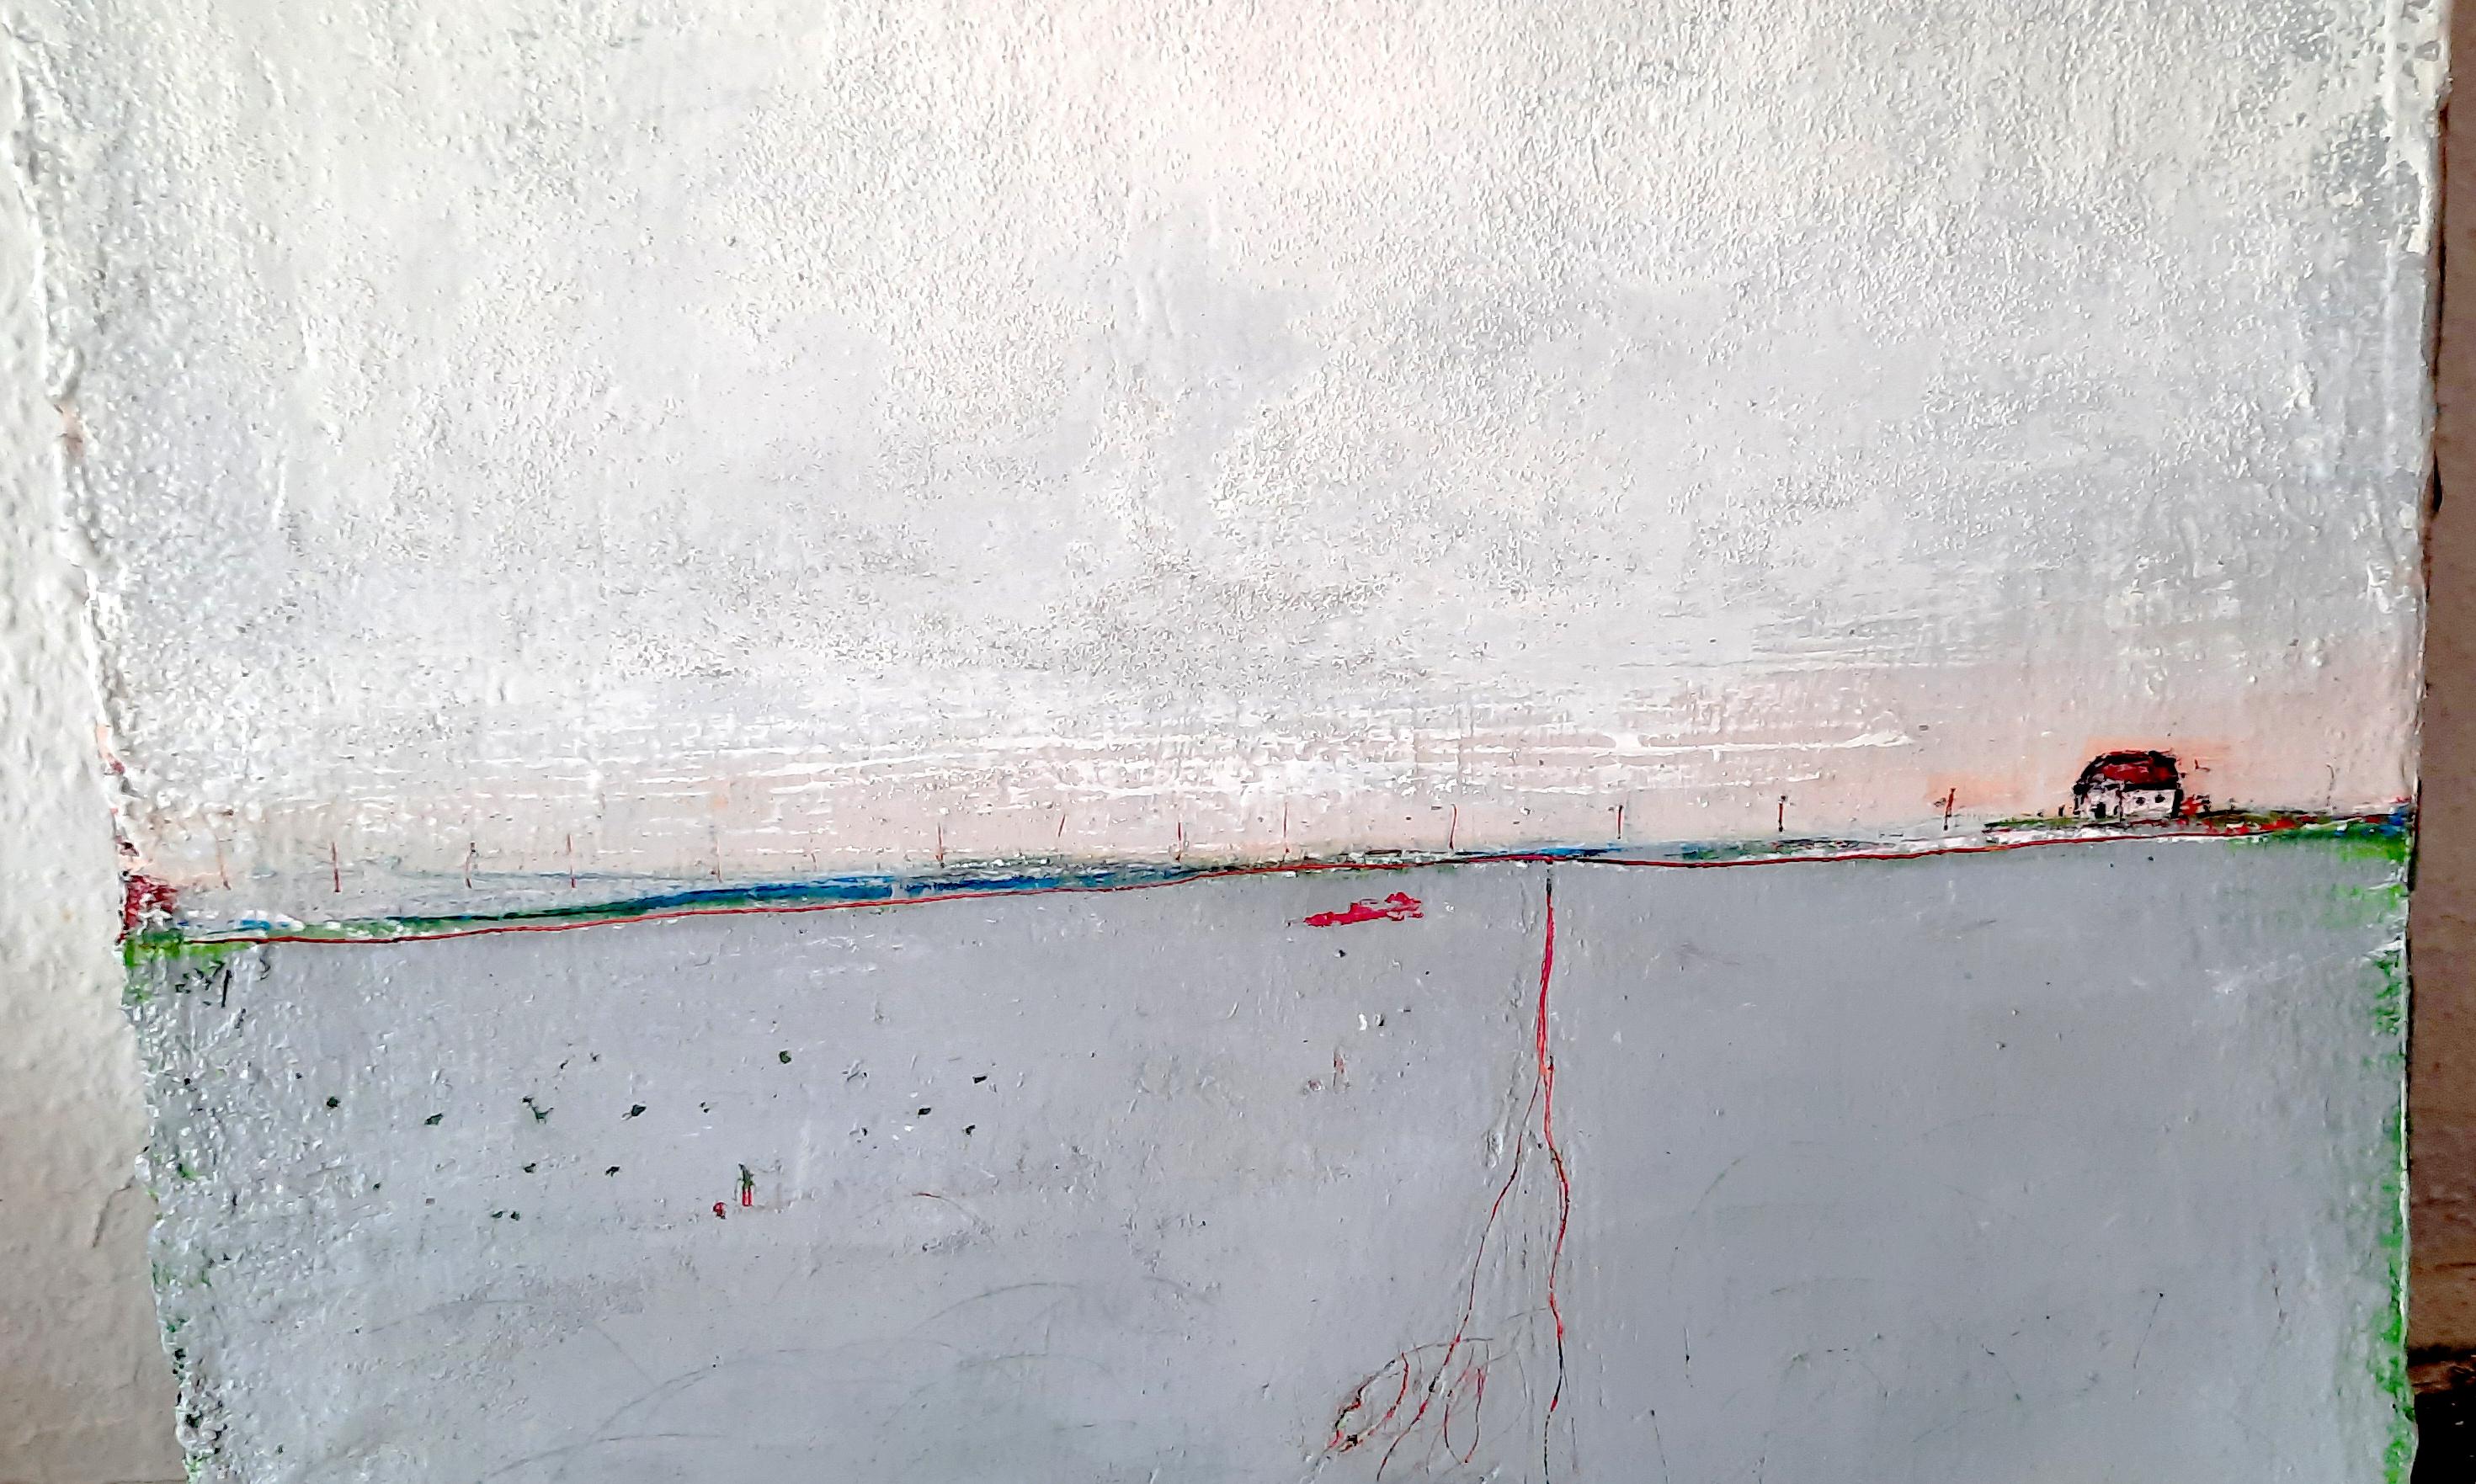 Bild groß - 155 x 190 cm - direkt zum Aufhängen